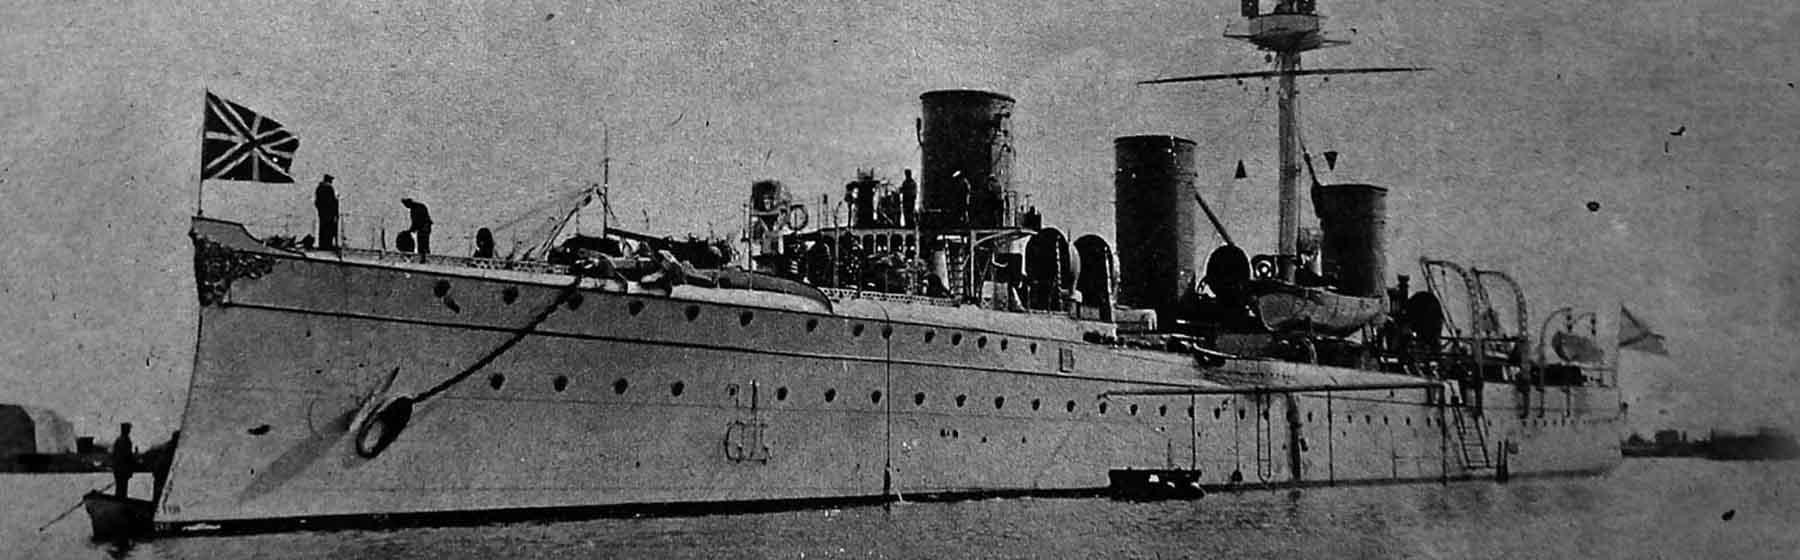 Russian cruiser Novik (1898)